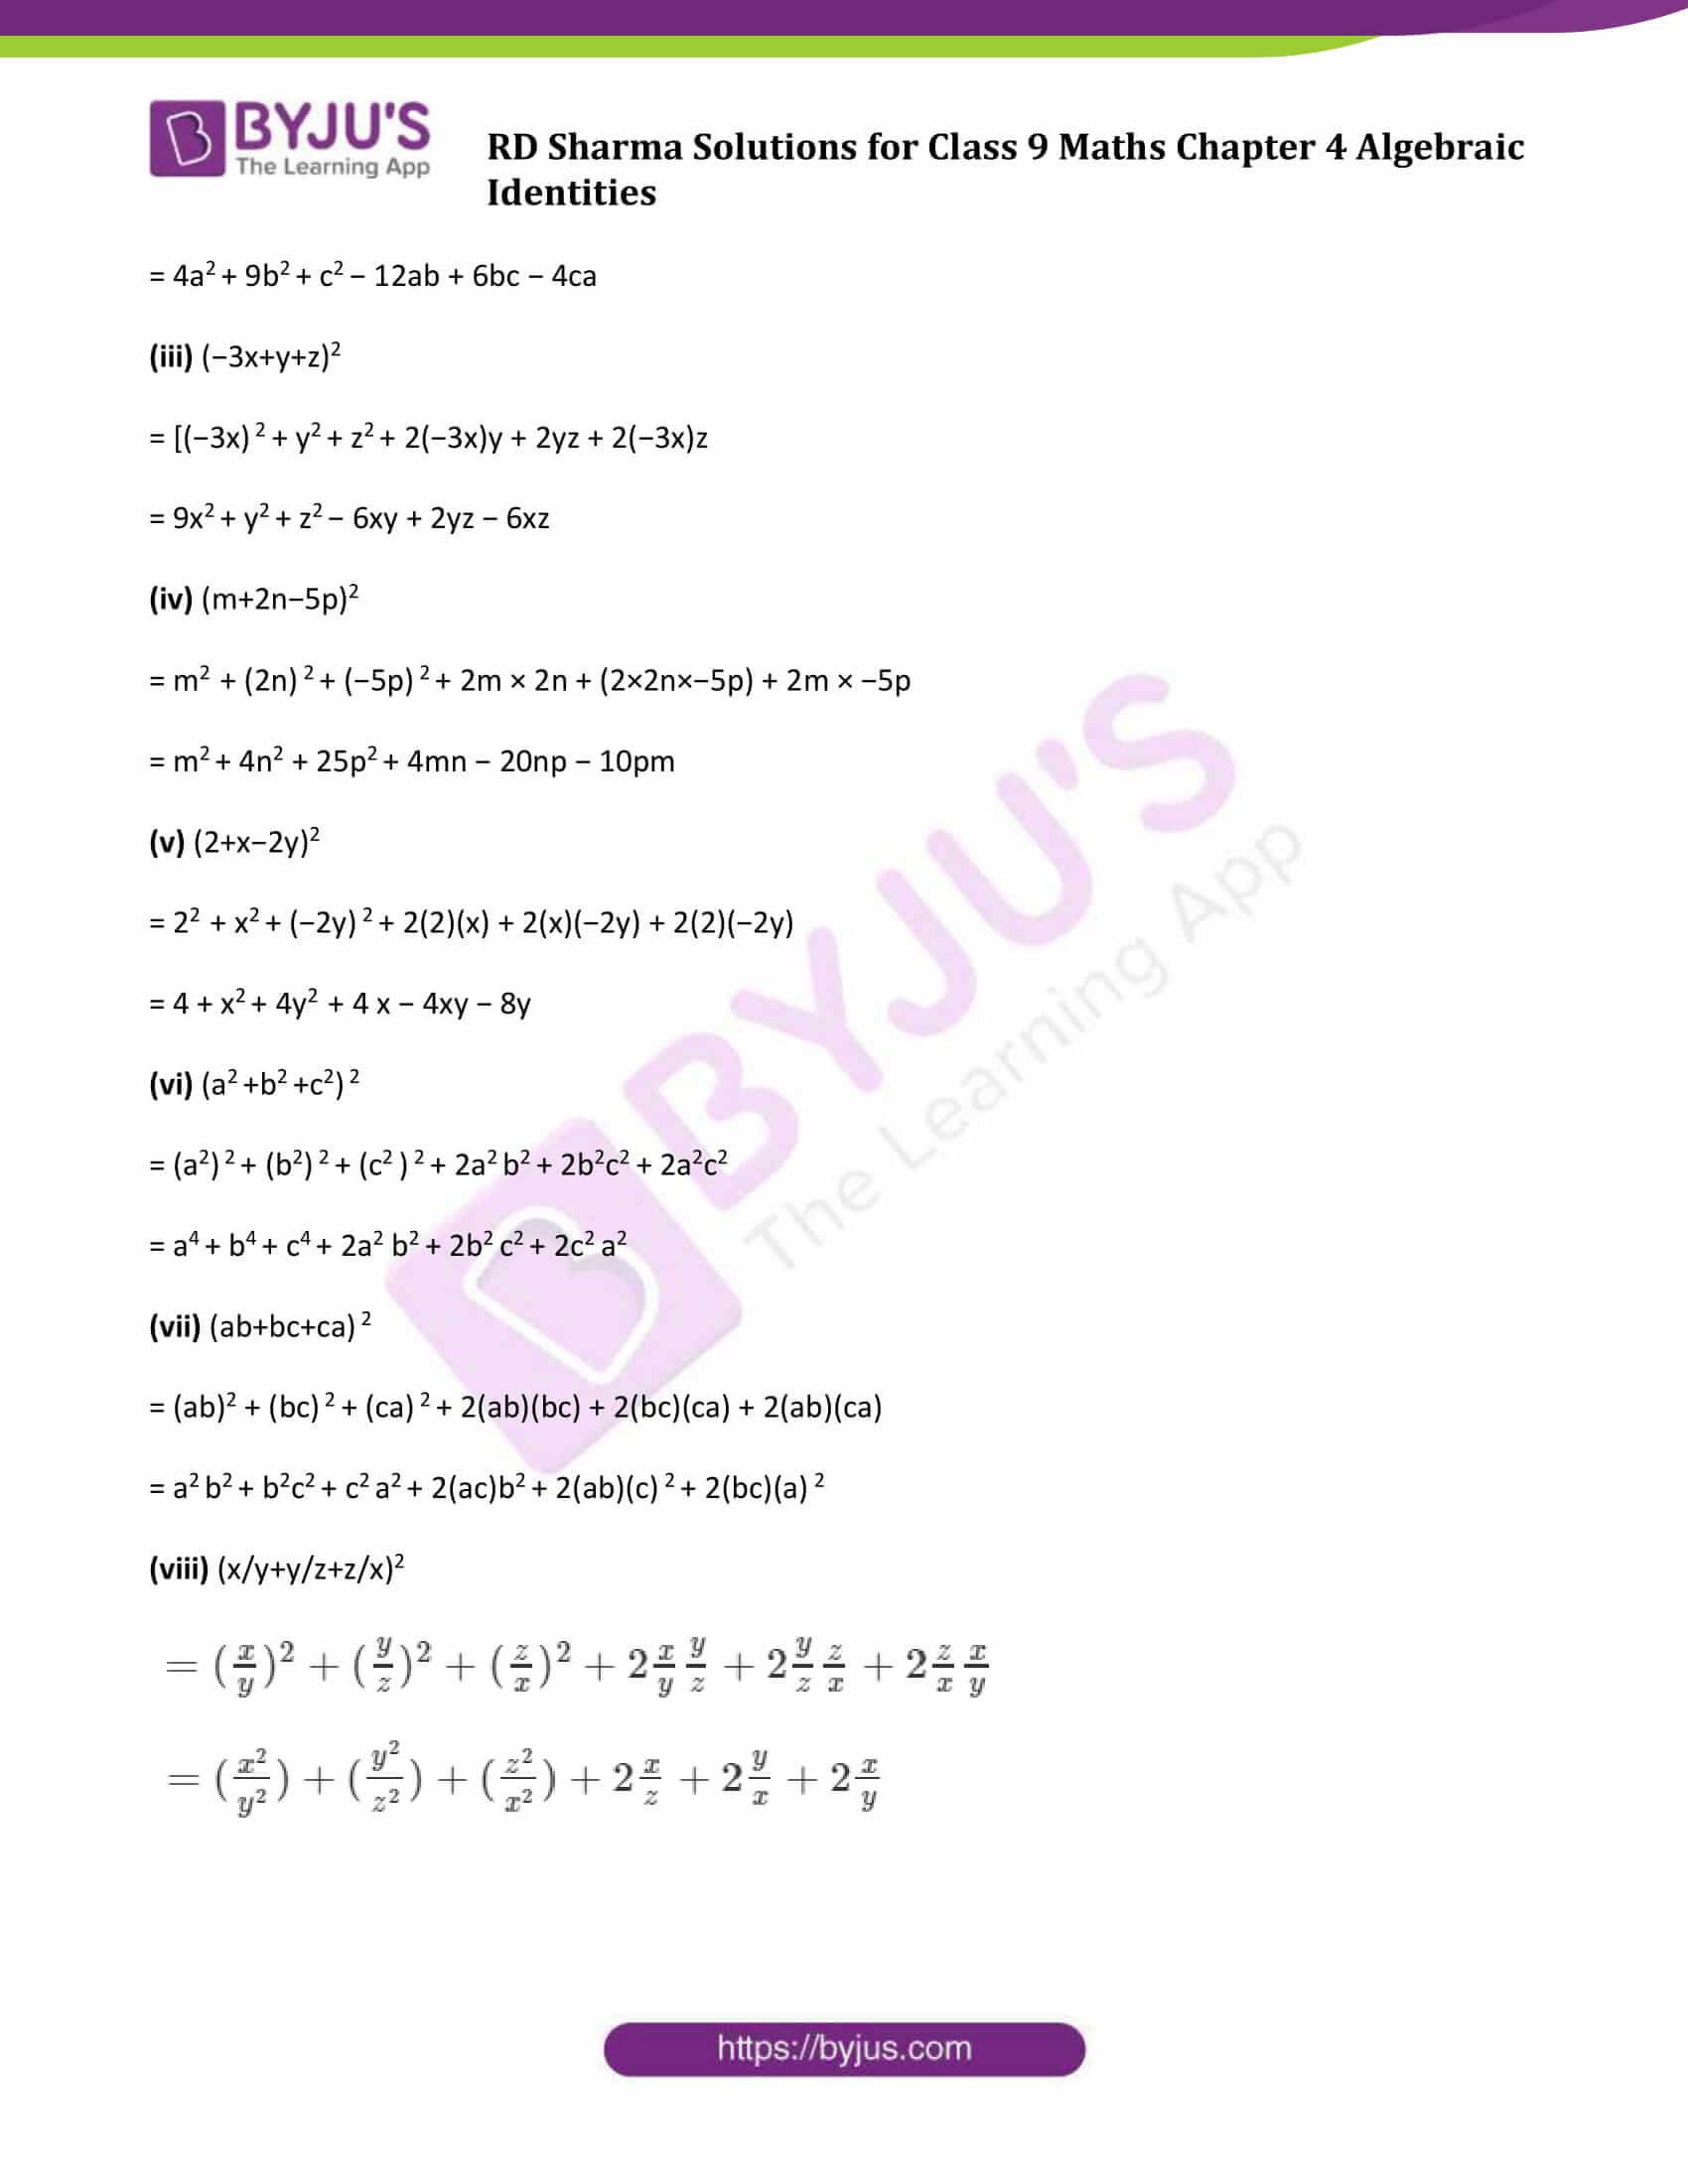 RD Sharma Solution class 9 Maths Chapter 4 Algebraic Identities 07